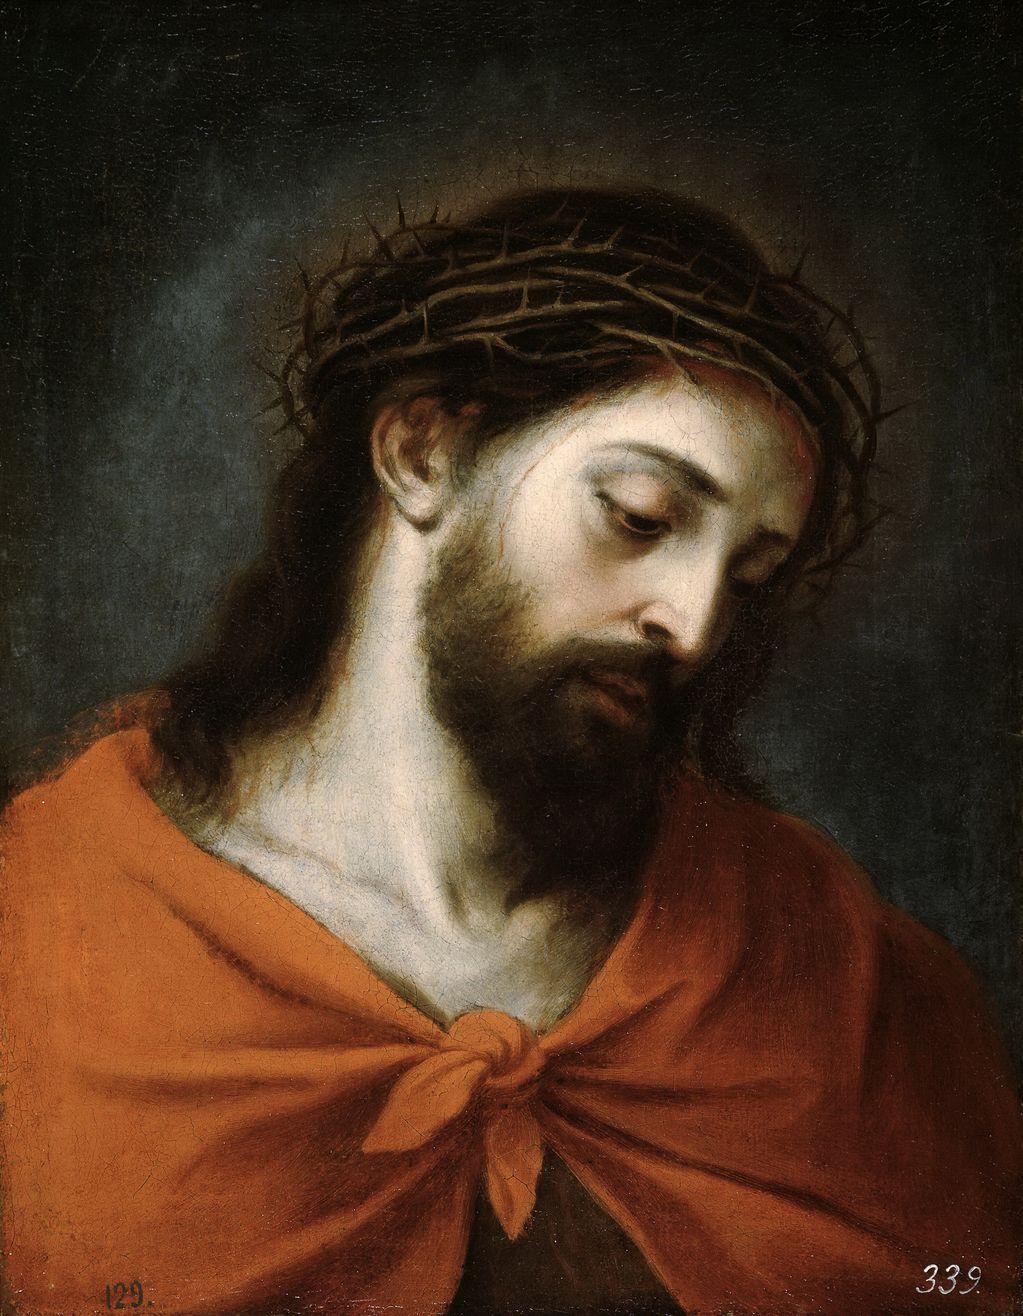 Мурильо Бартоломе Эстебан (1617-1682) Ecce Homo